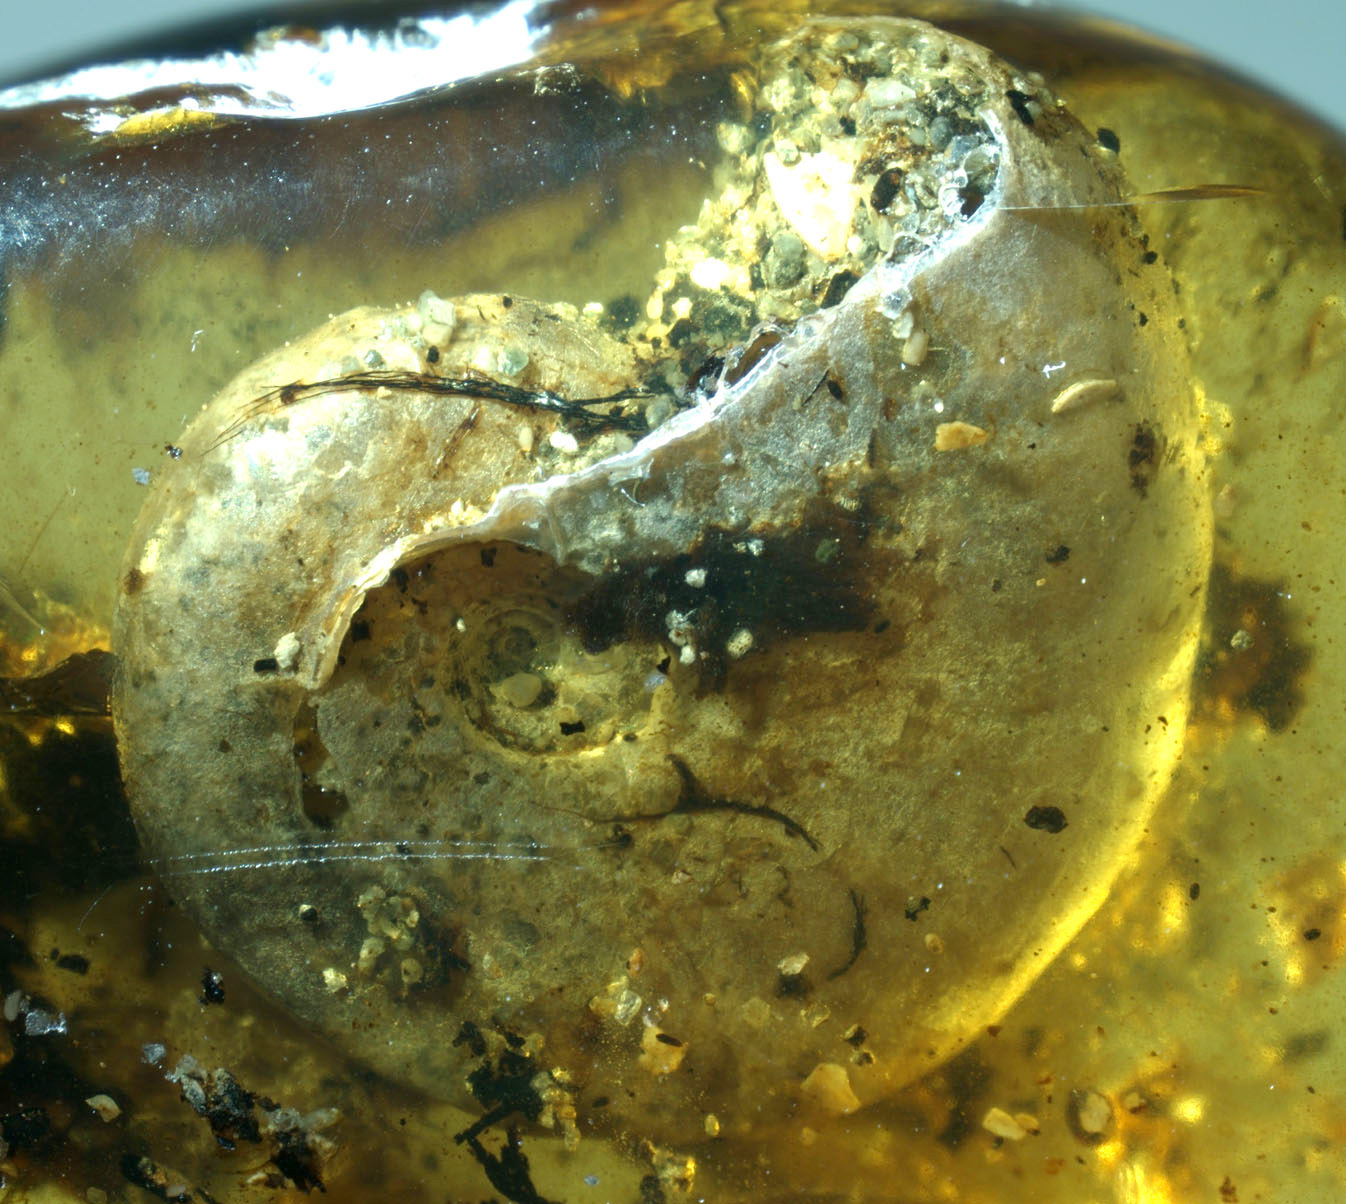 01-amber-200433.jpg